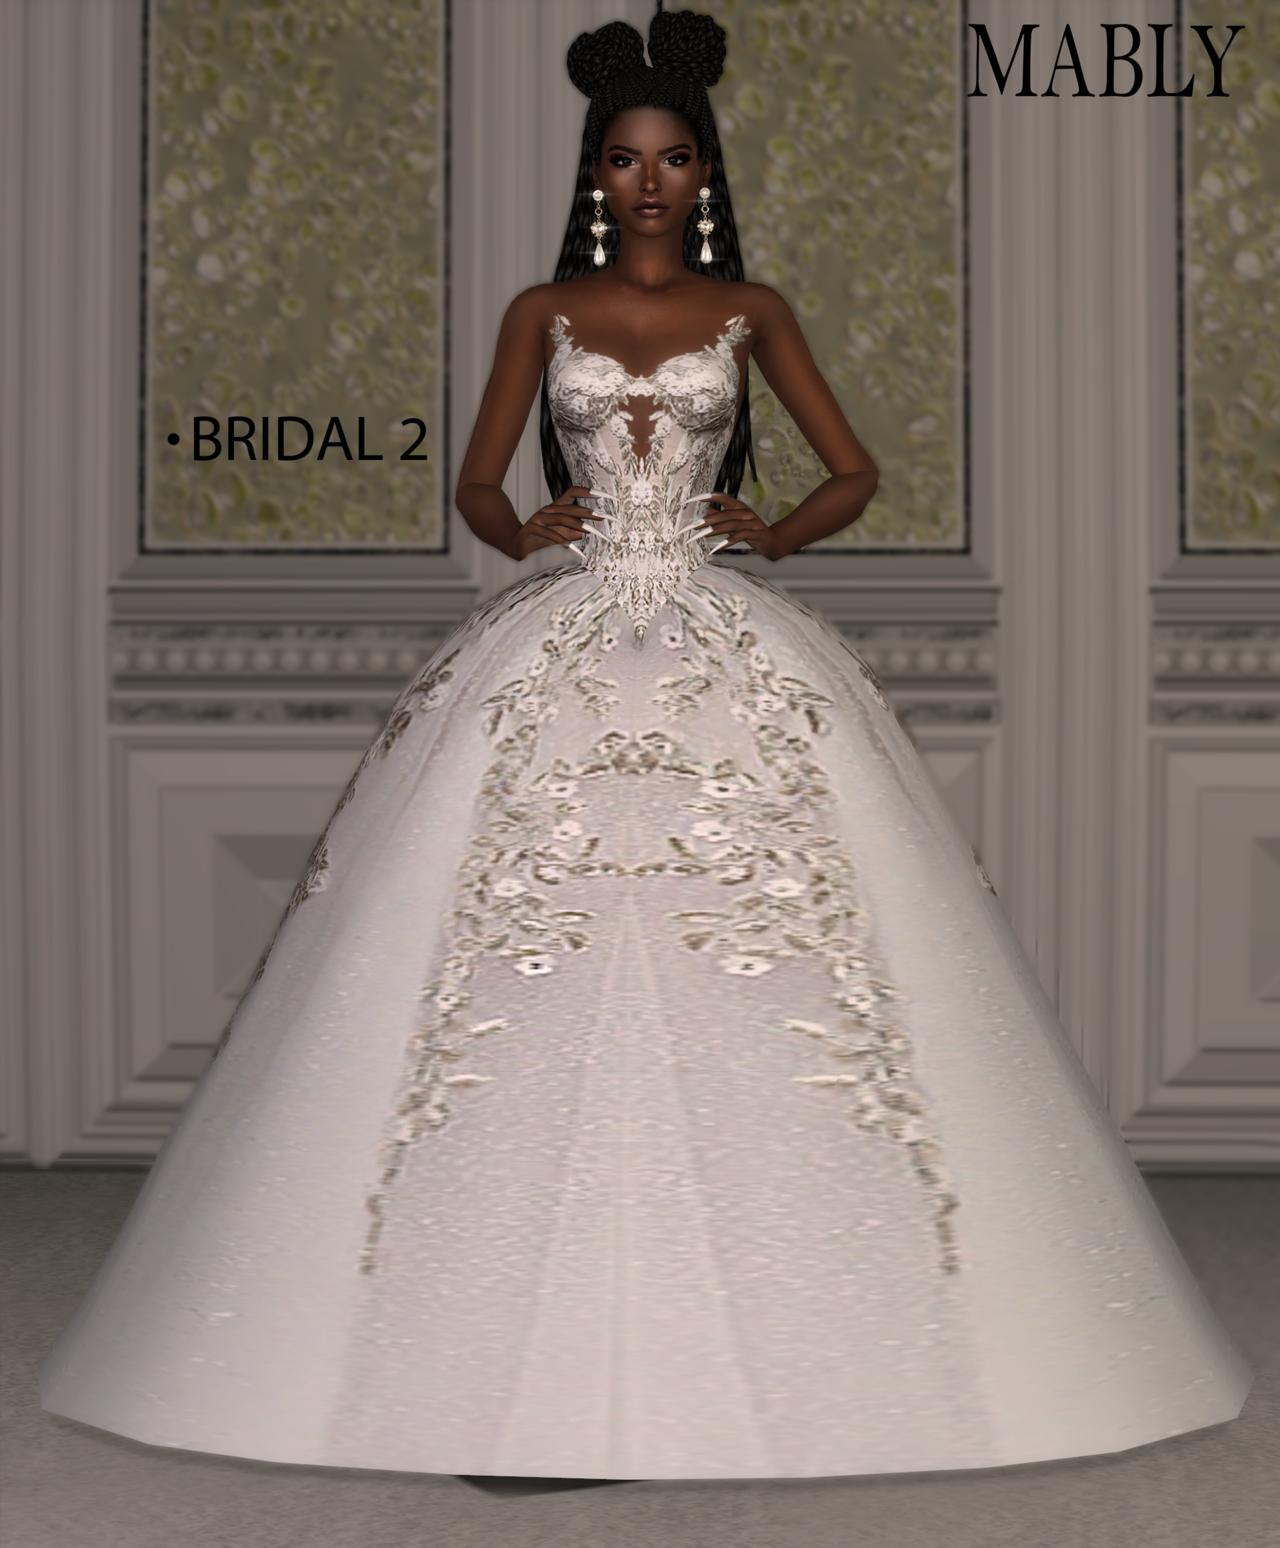 Sims 4 Wedding Dresses Beo Creations - raveitsafe